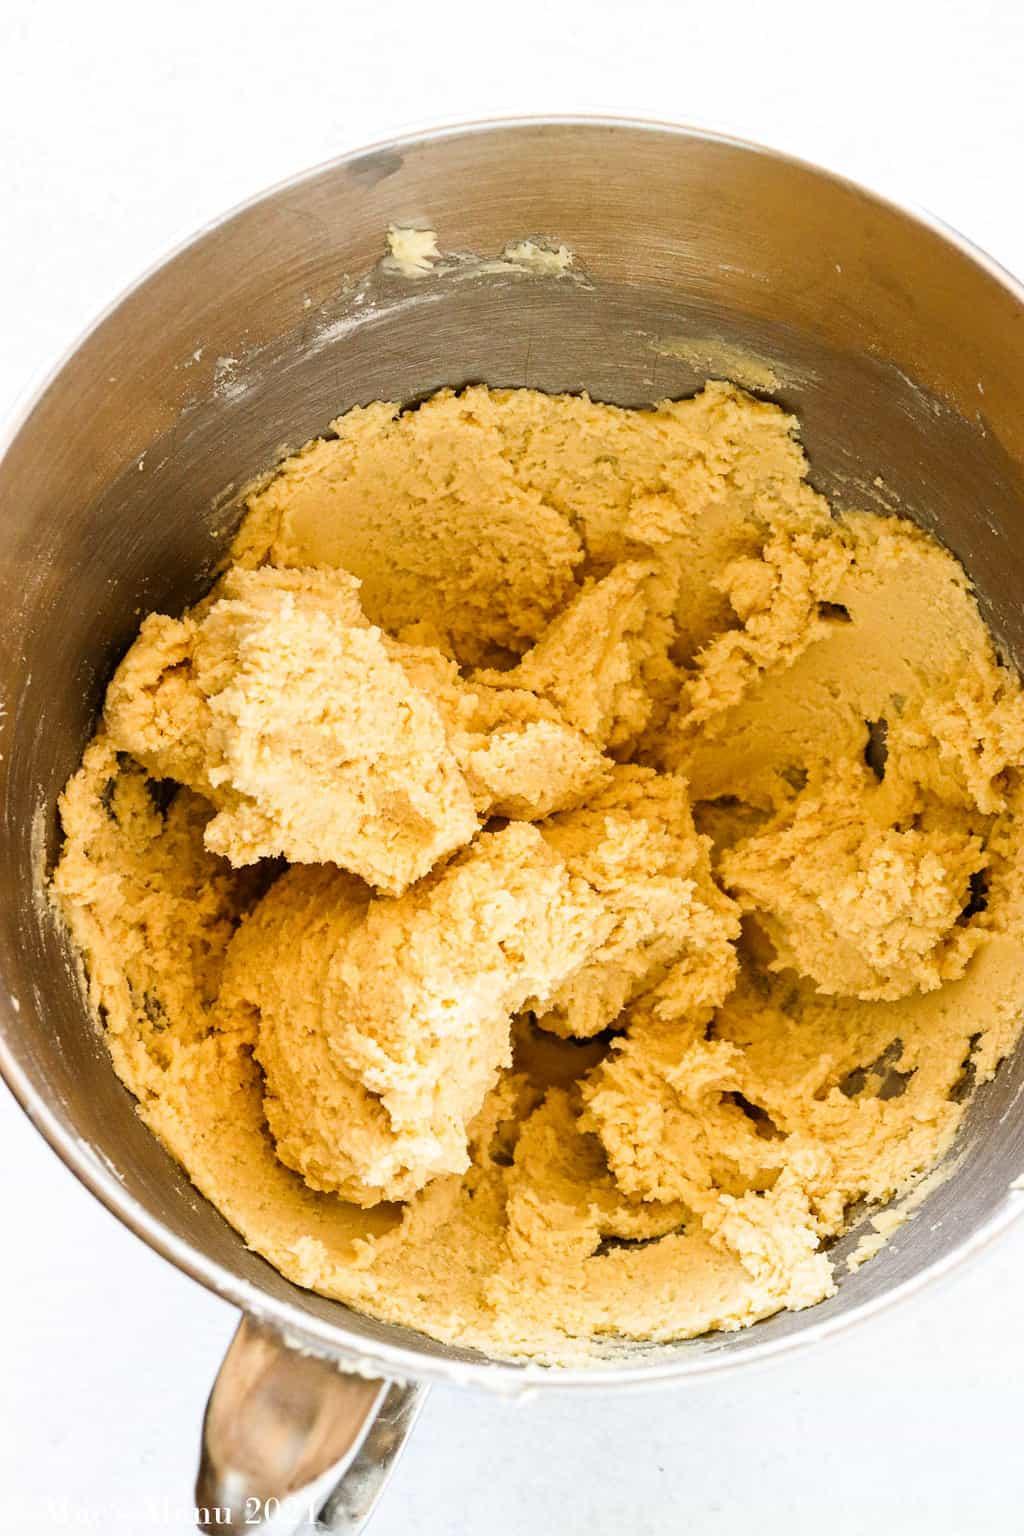 Cream cheese spritz cookies dough in a mixing bowl